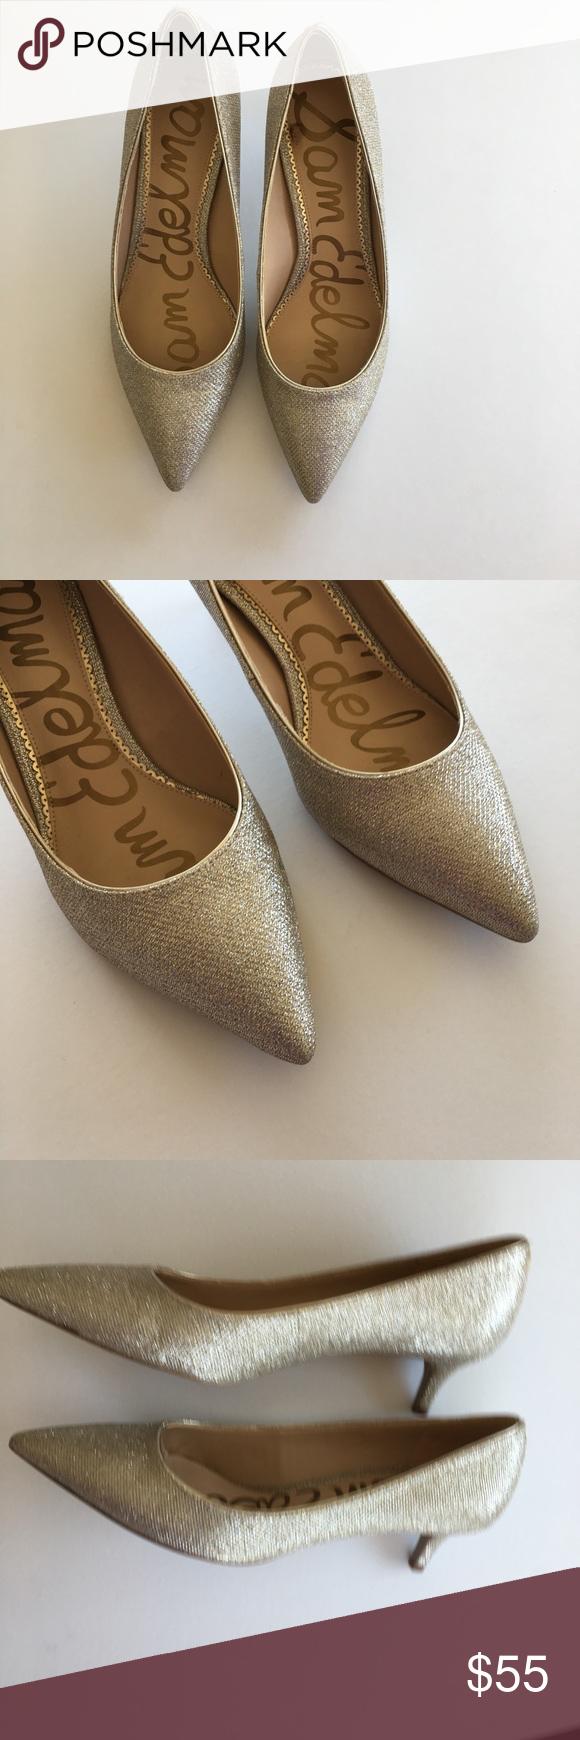 Sam Edelman Dori Kitten Heel Lt Gold Mesh 10 5 M Shoes Women Heels Sam Edelman Shoes Kitten Heels